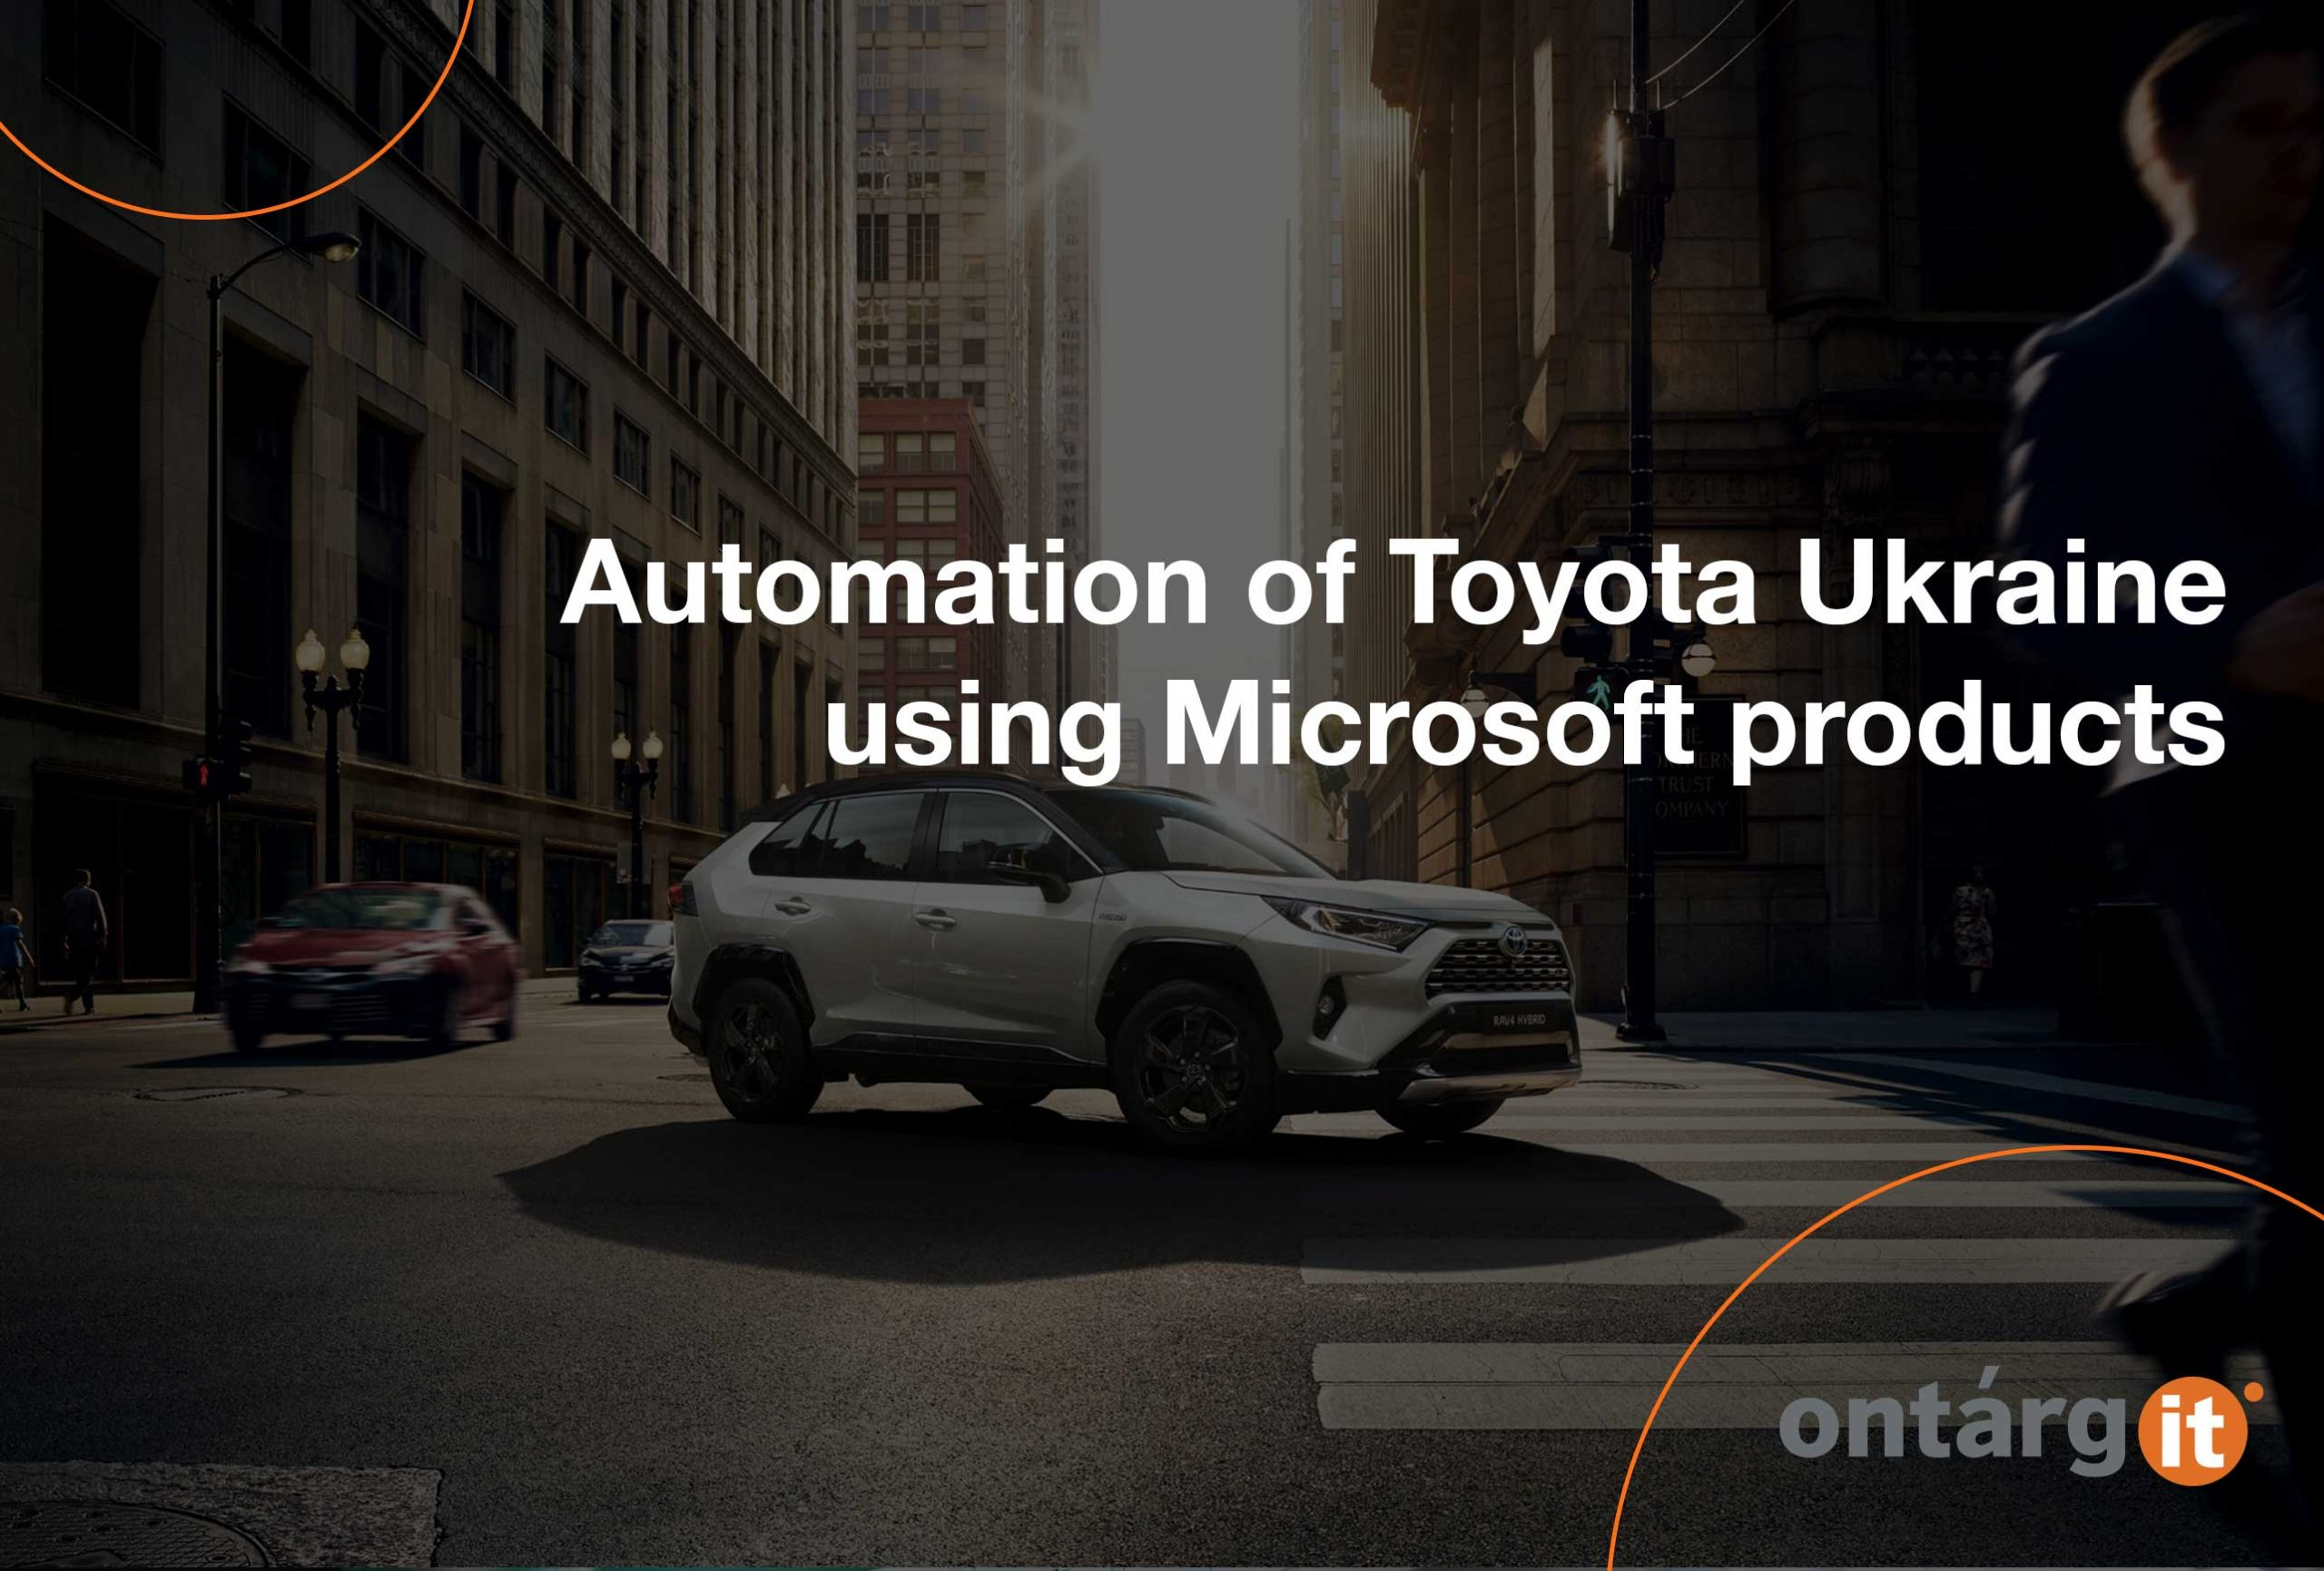 Automation of Toyota Ukraine using Microsoft products